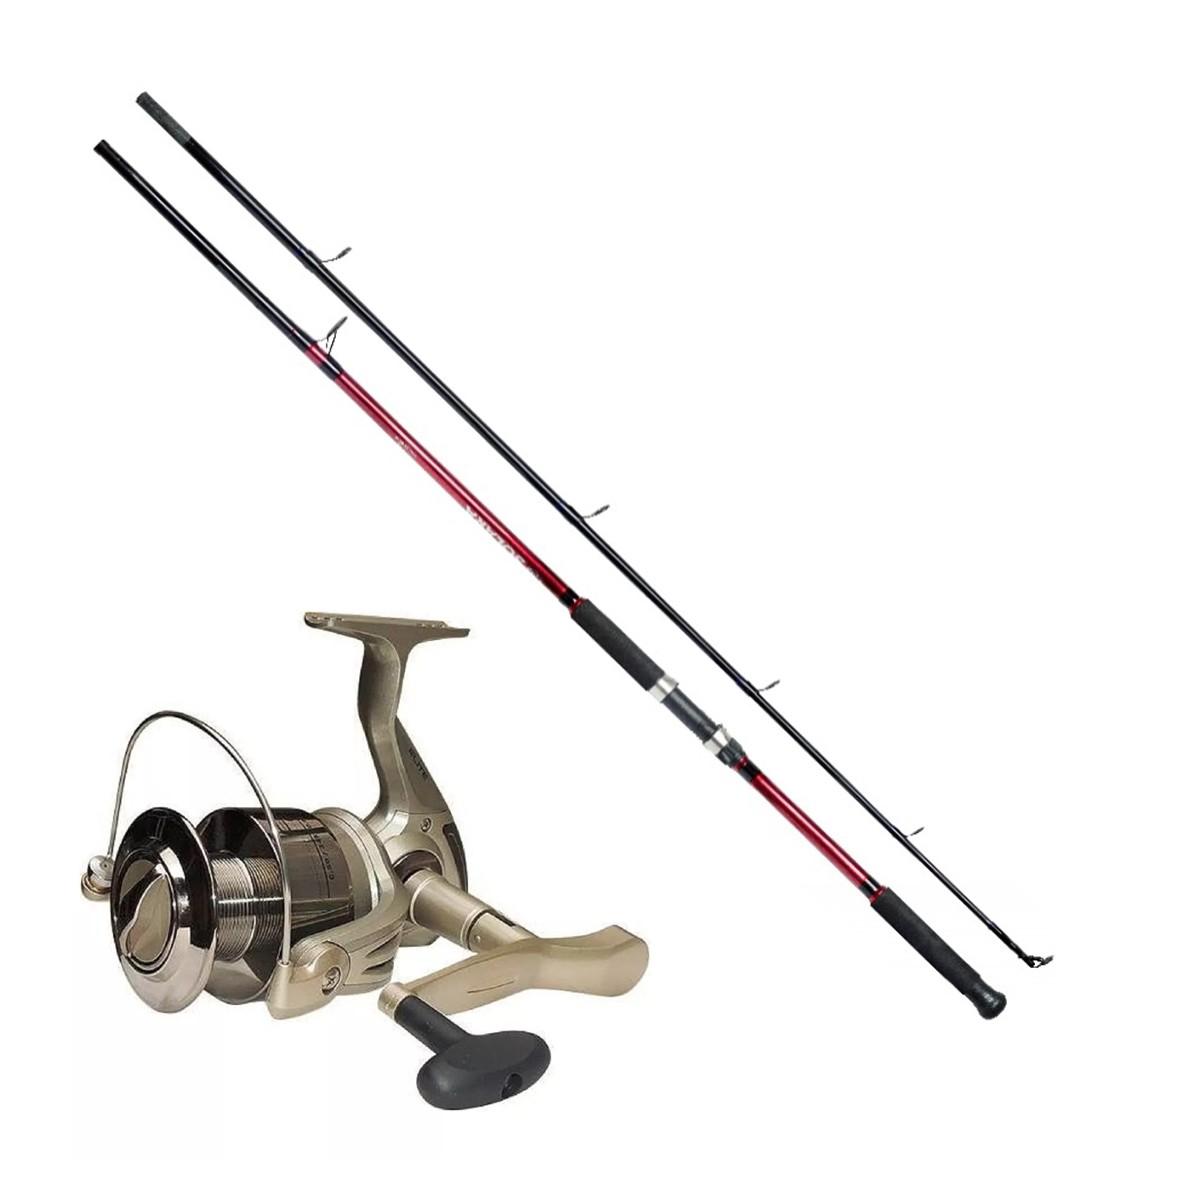 Kit Molinete Pesca Elite 5000 + Vara Solara 2,40M 25Lbs Até 12 Kilos Vermelha